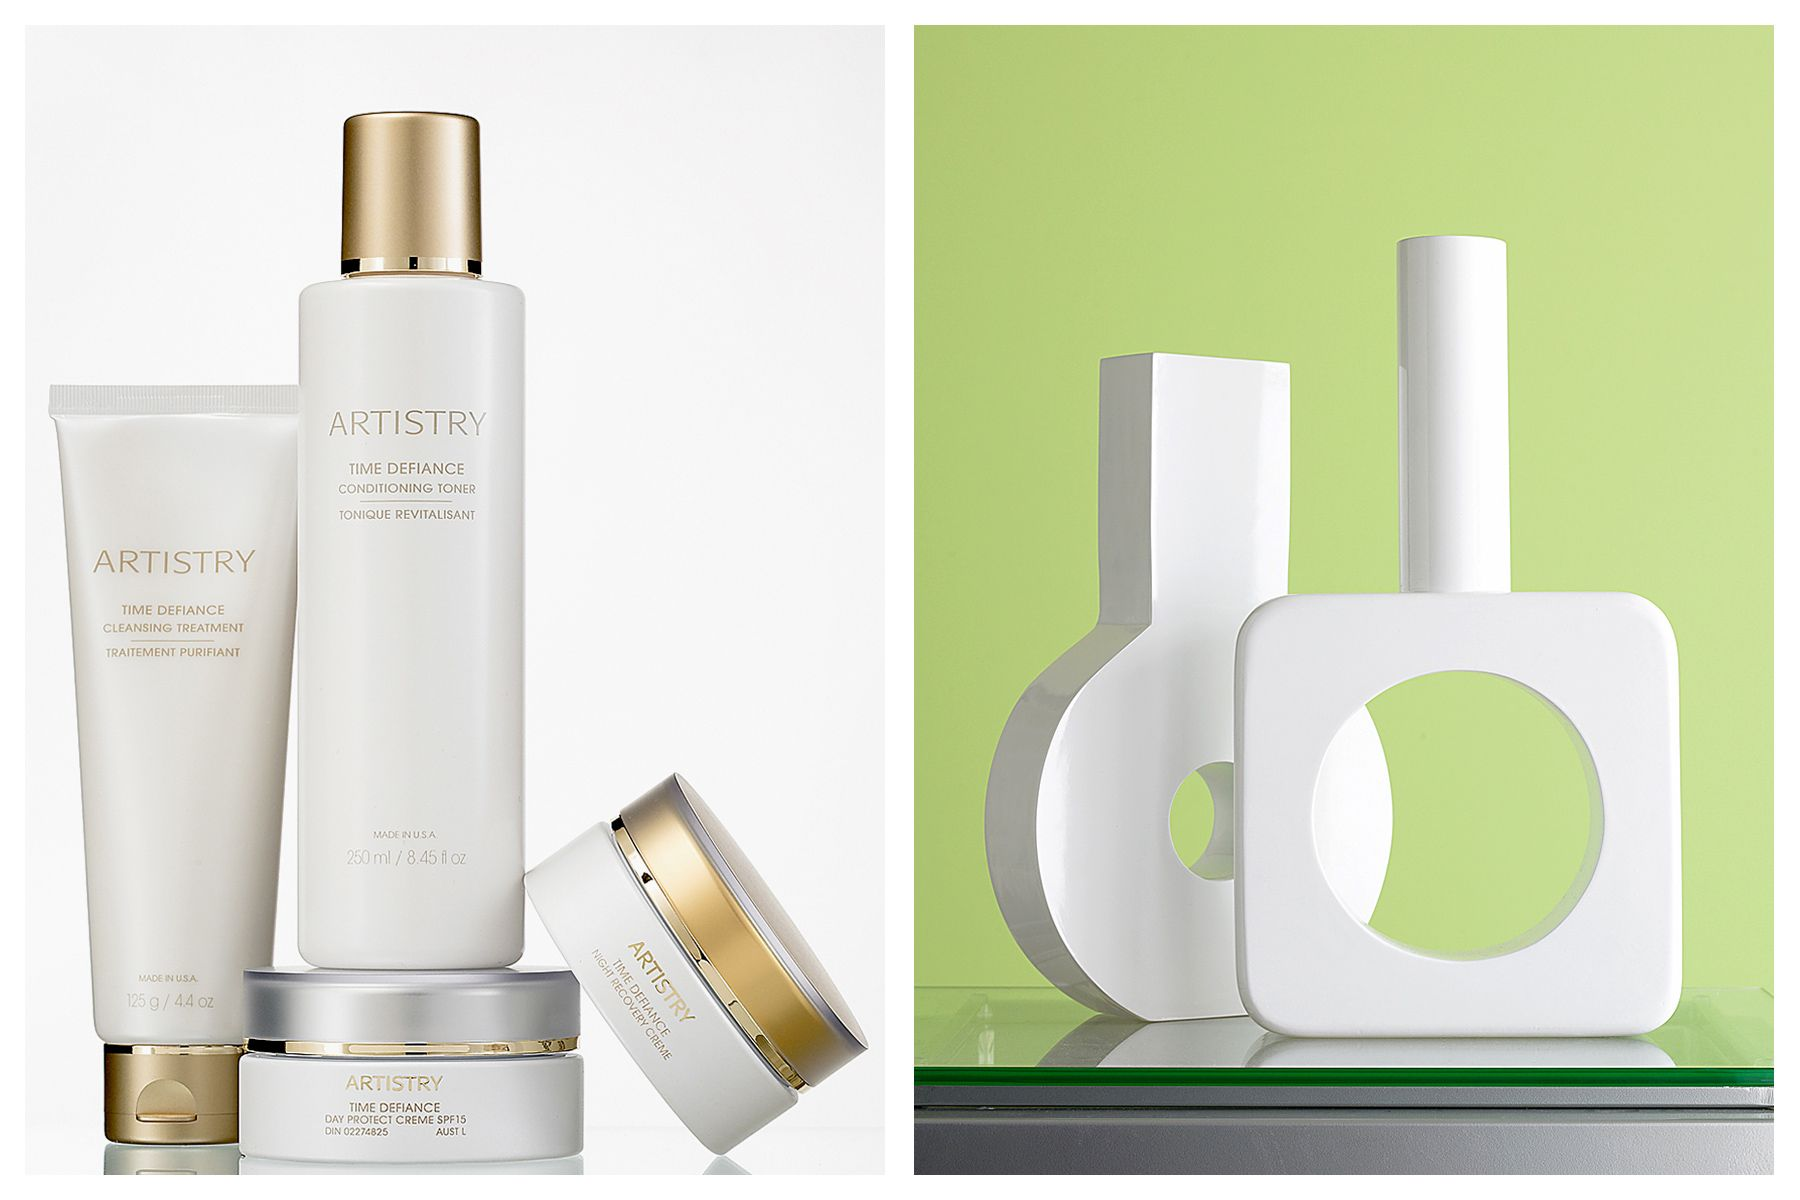 Cosmetics-2-Images.jpg